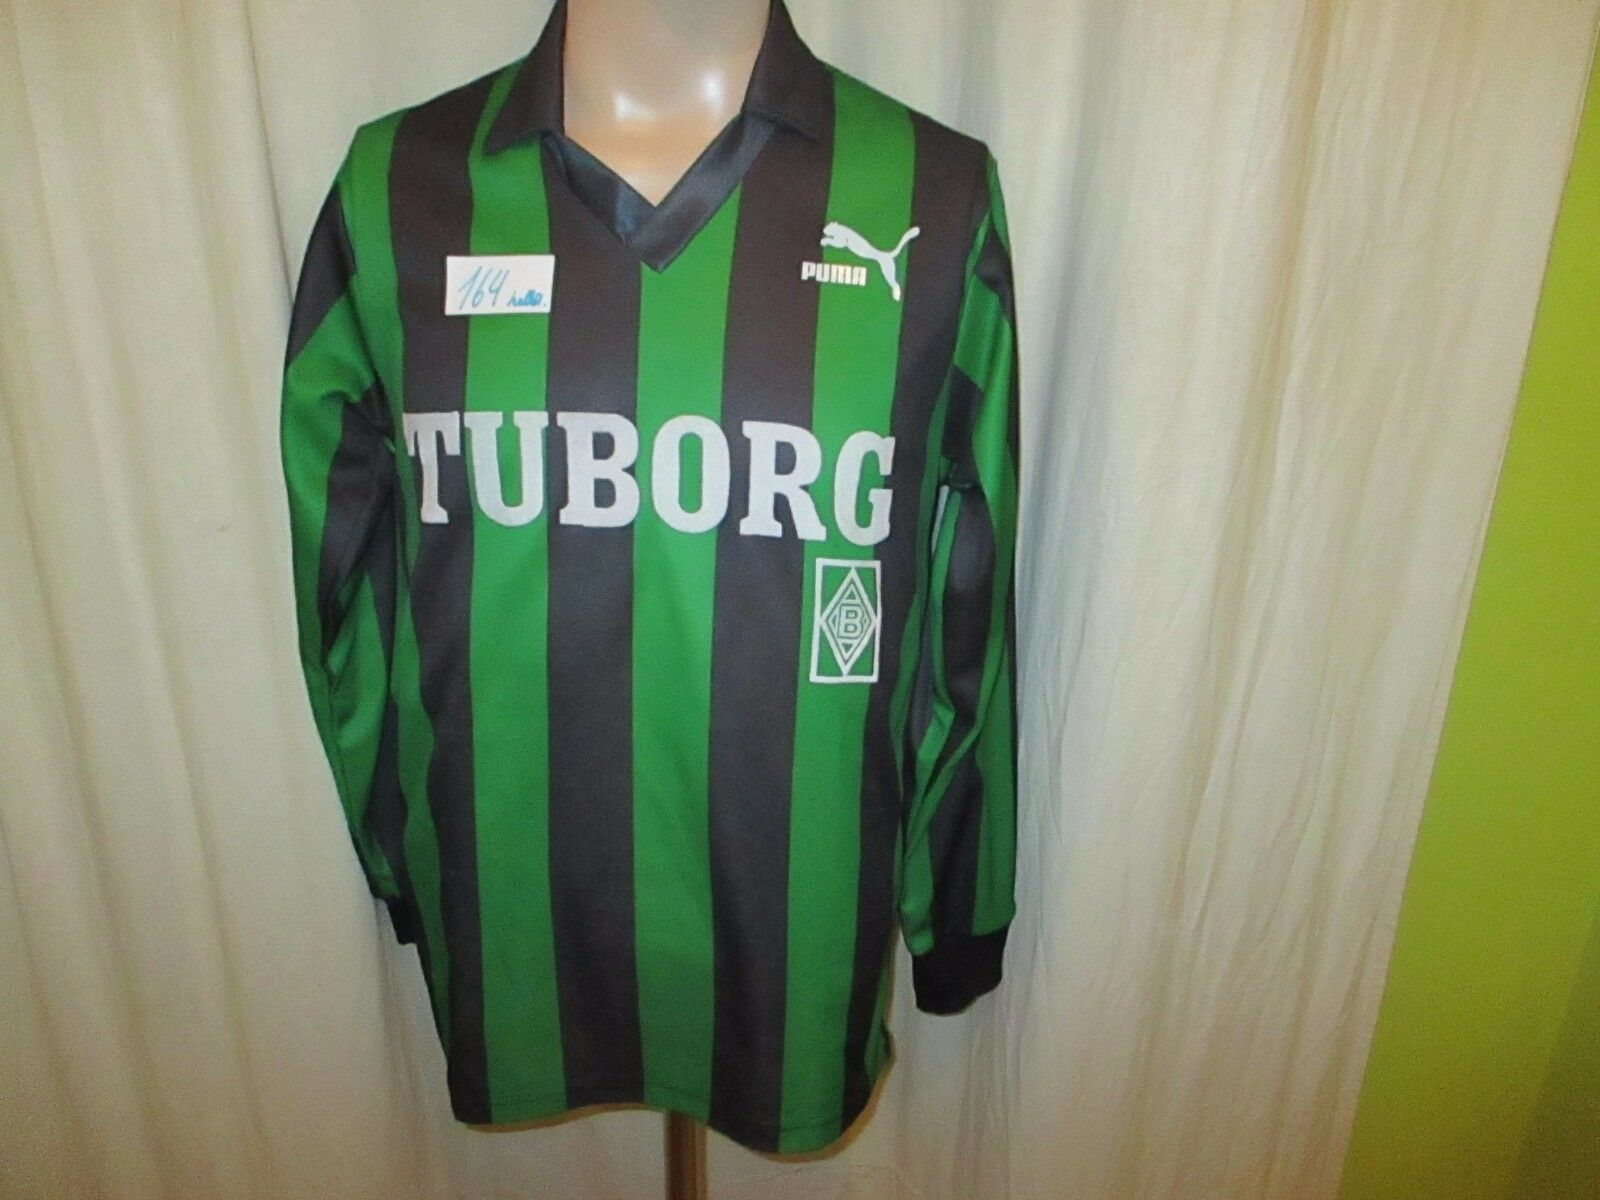 Borussia Mönchengladbach Original Puma Langarm Trikot 1991 92  TUBORG  Gr.S TOP  | Toy Story